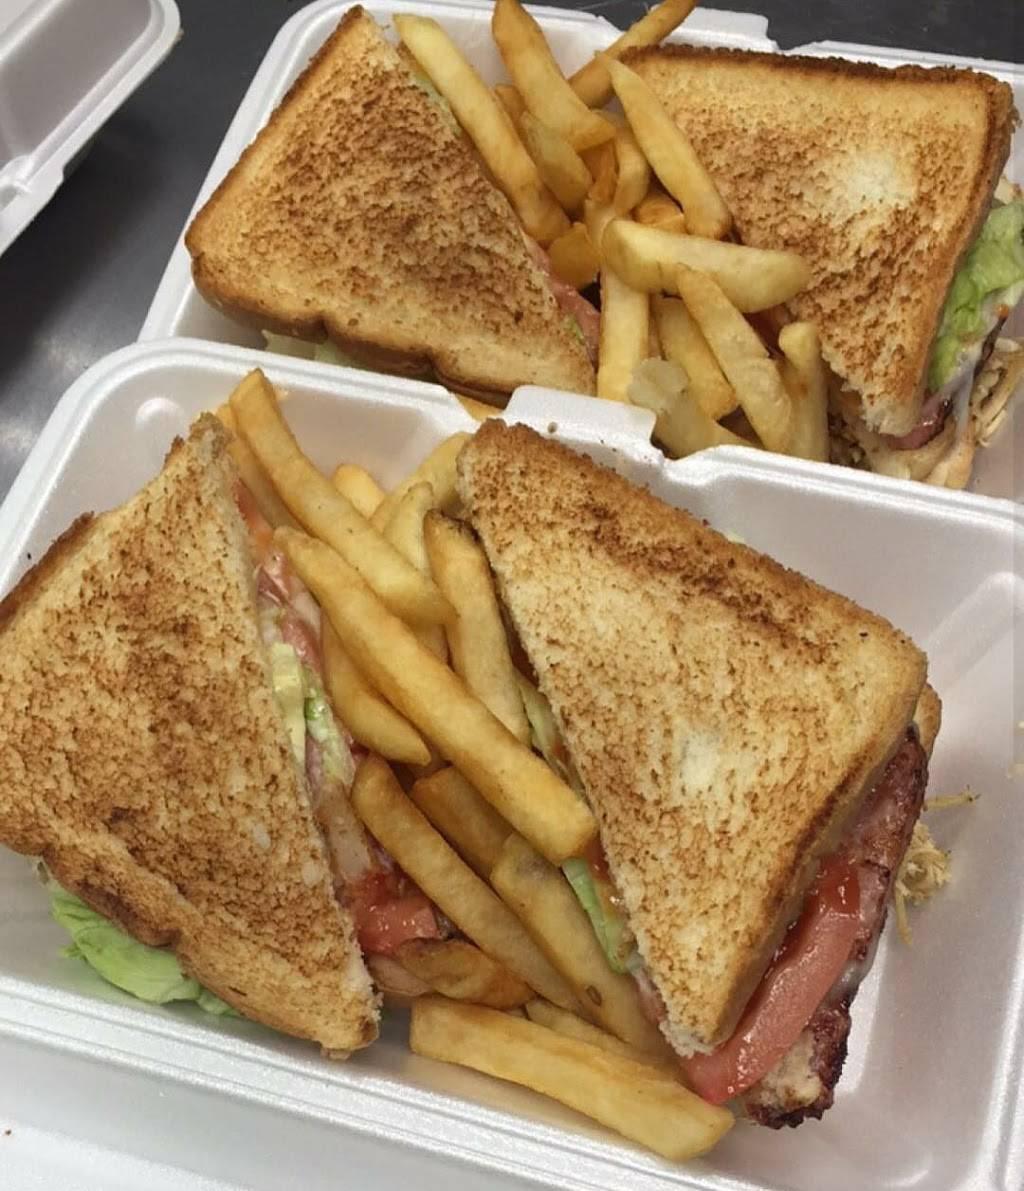 Munchies The Best Taste | restaurant | 396 E Tremont Ave, Bronx, NY 10457, USA | 3475775934 OR +1 347-577-5934